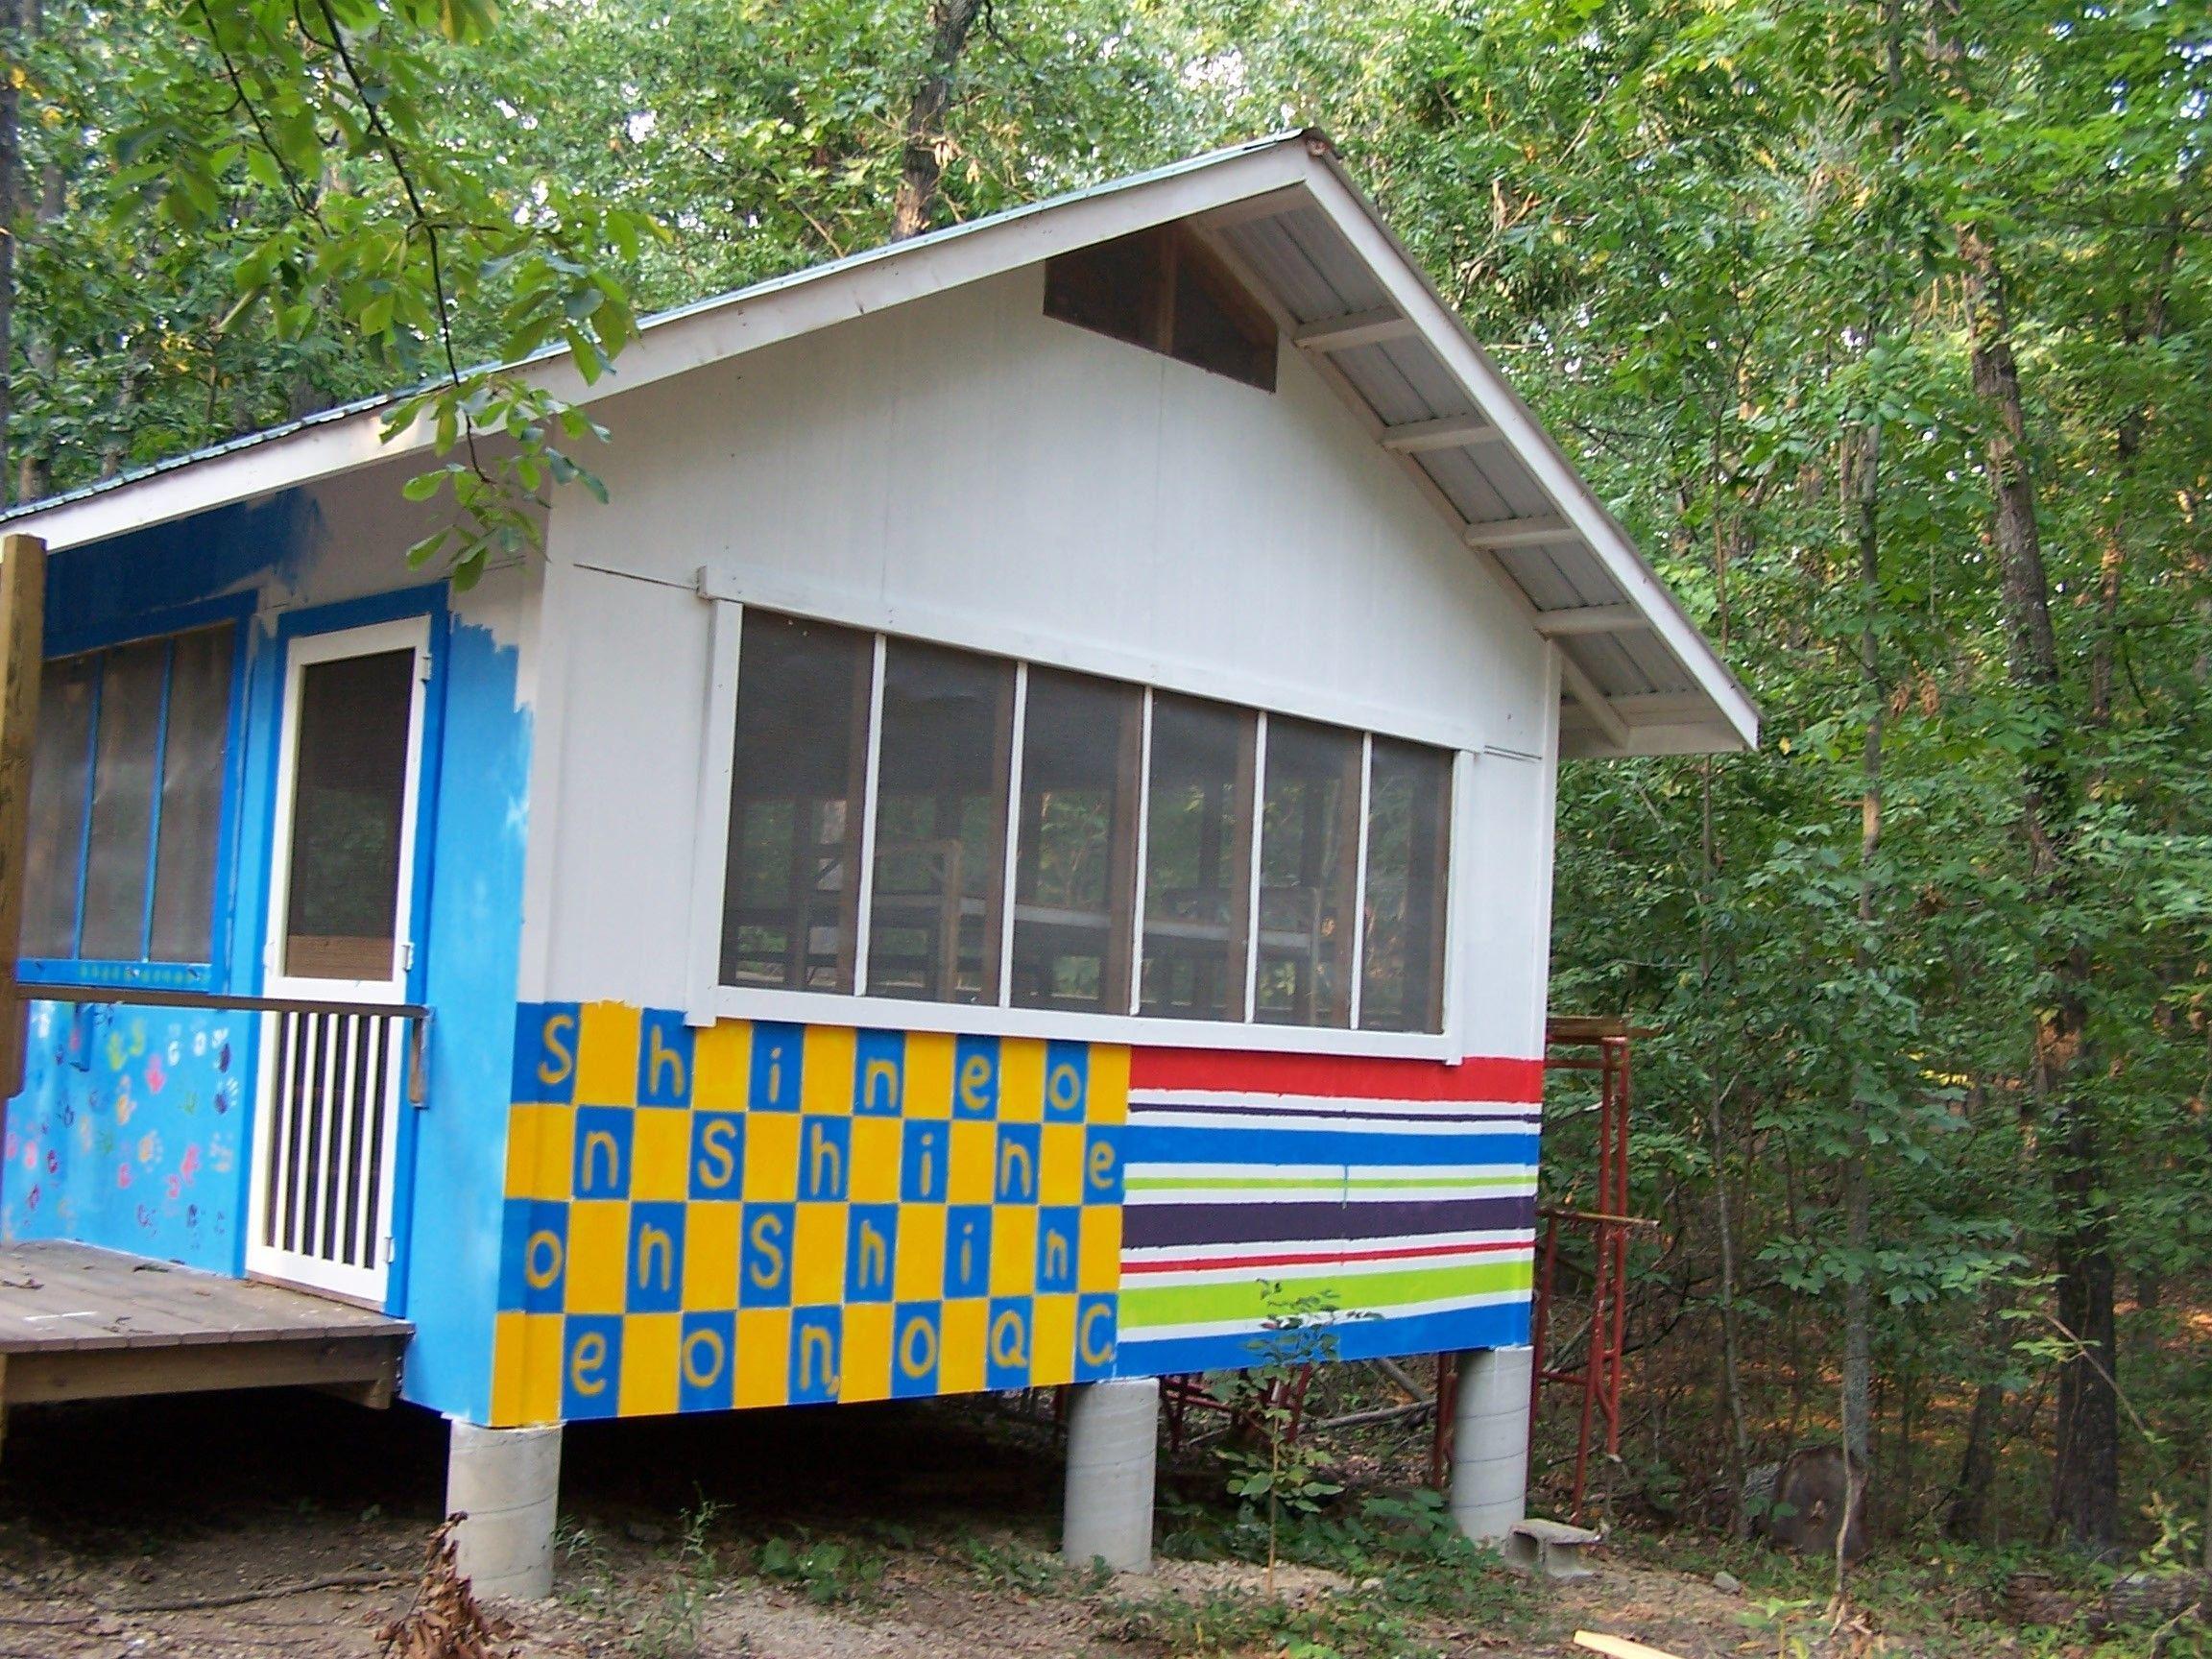 Cabin Mural Reading Shine On